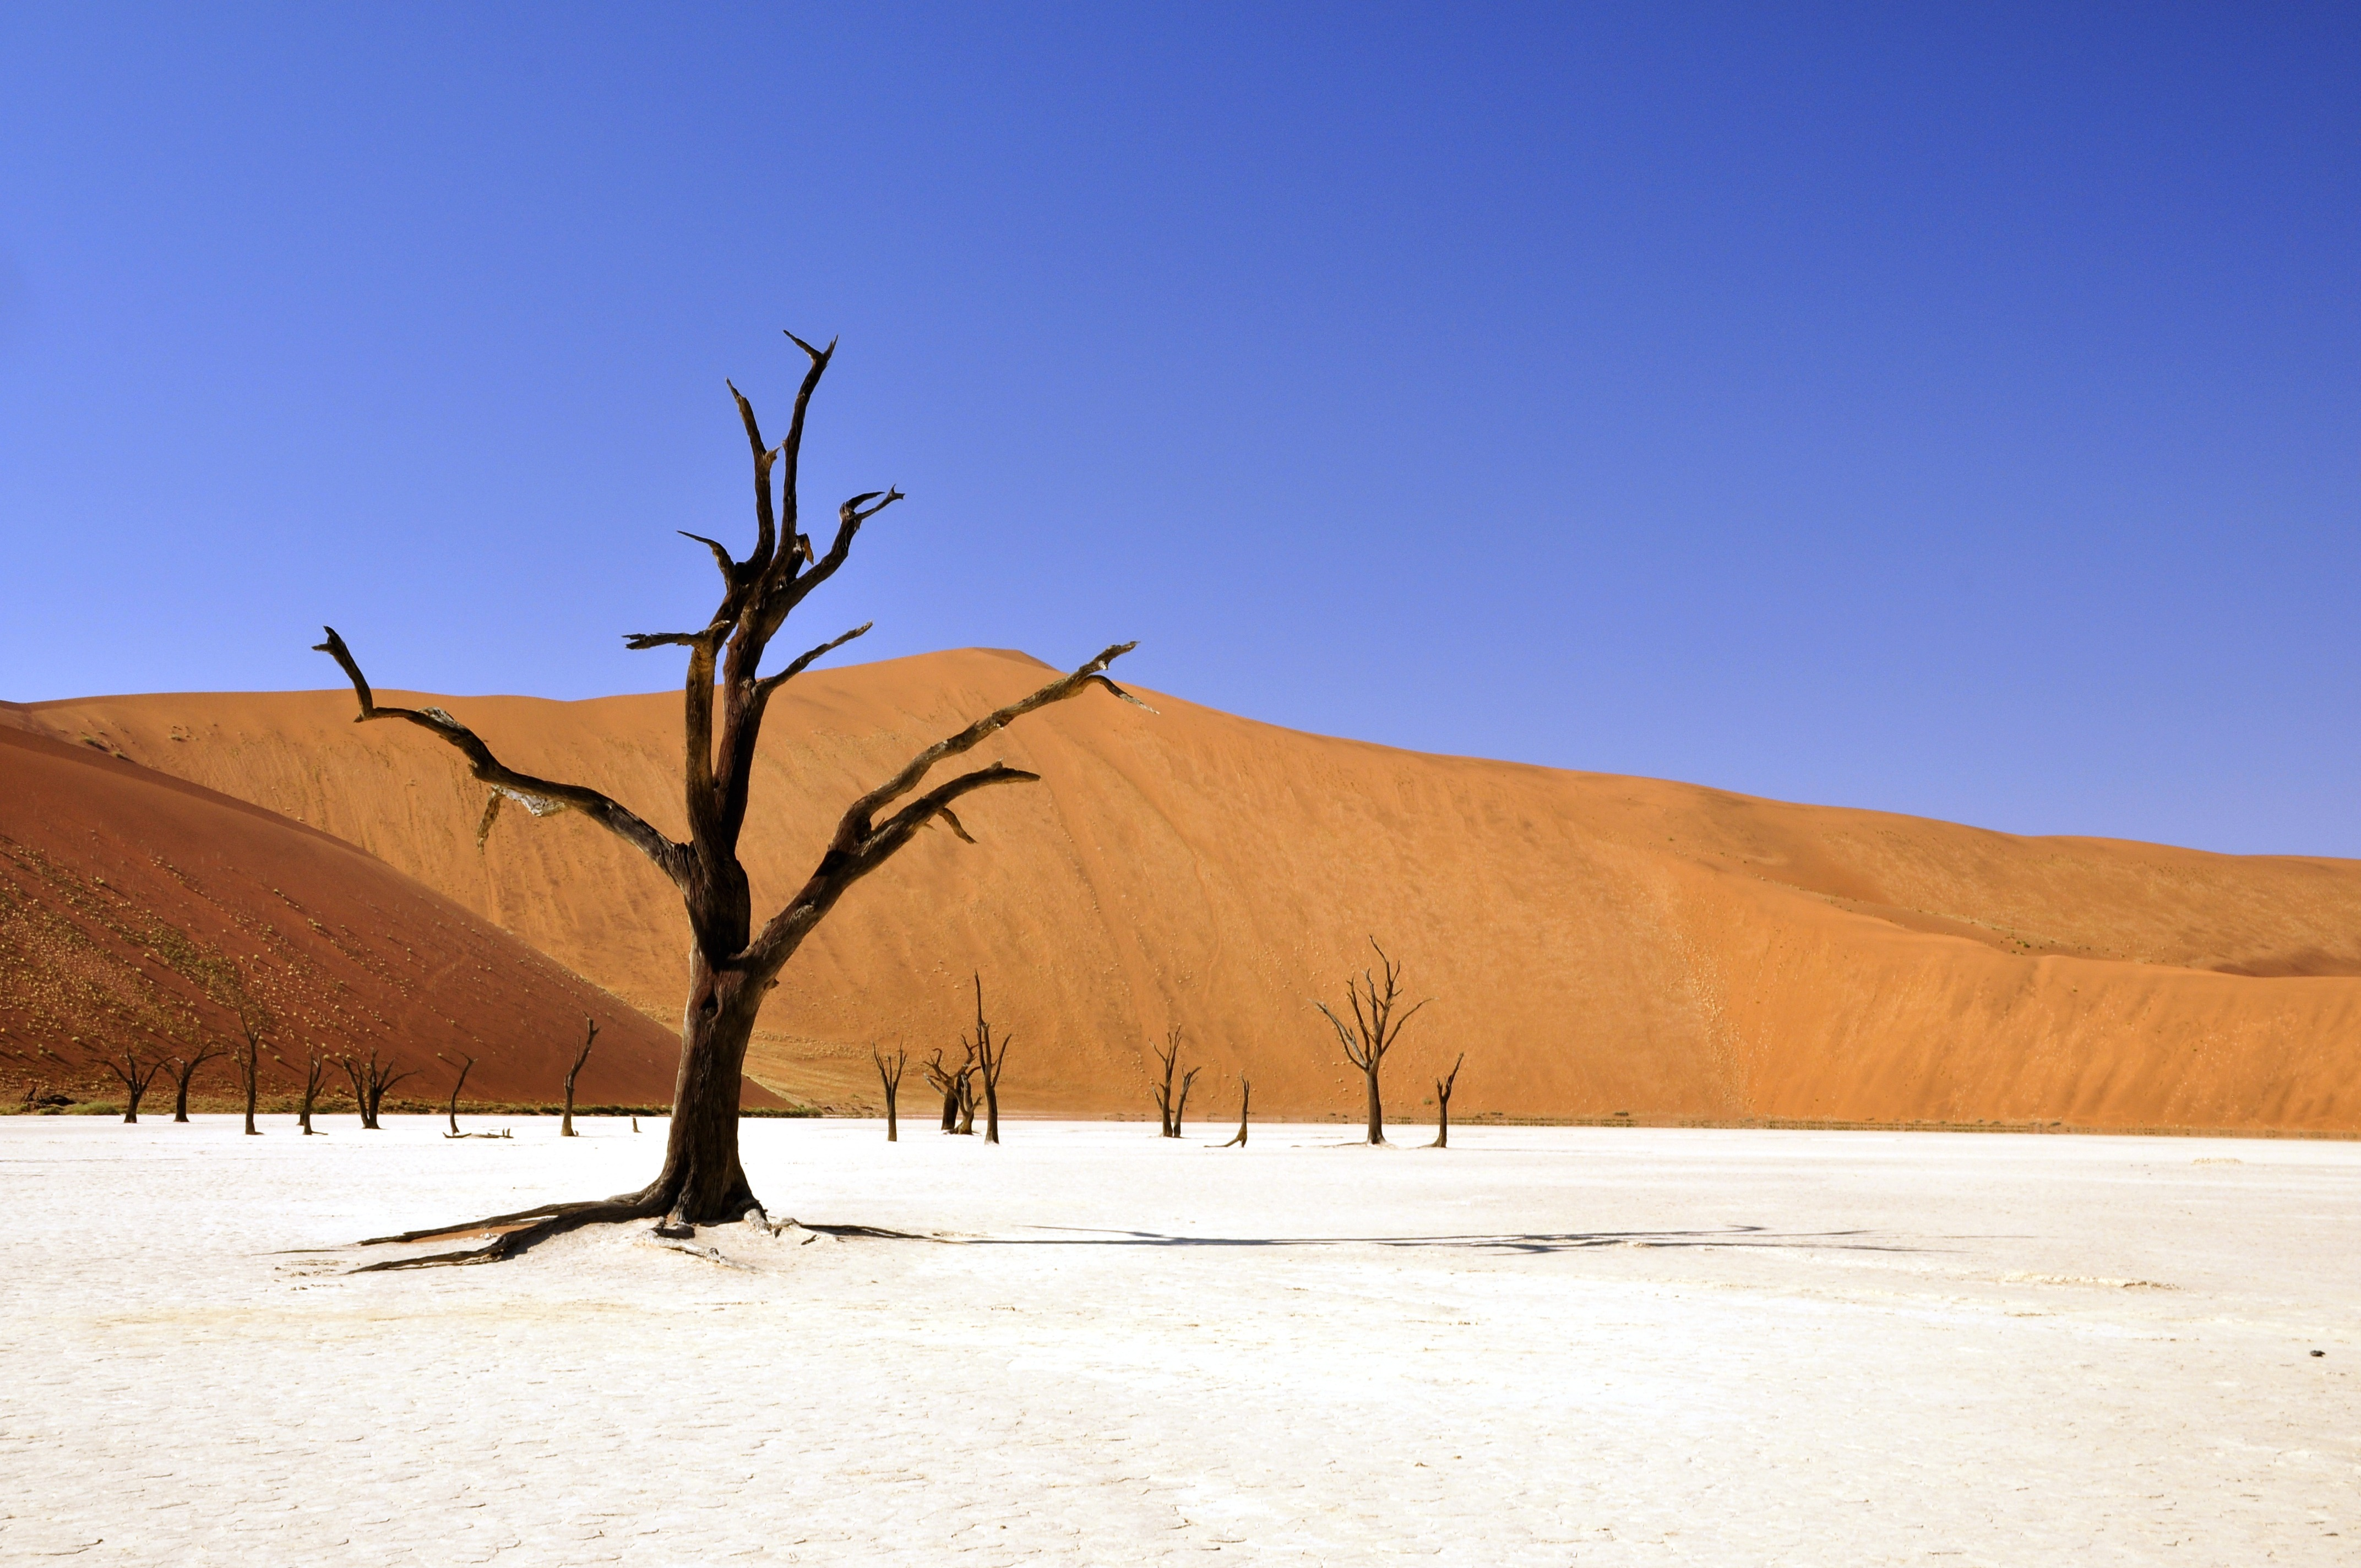 dry tree in the desert, desert, dry, dunes, branches, dead tree, heat, drought, sand